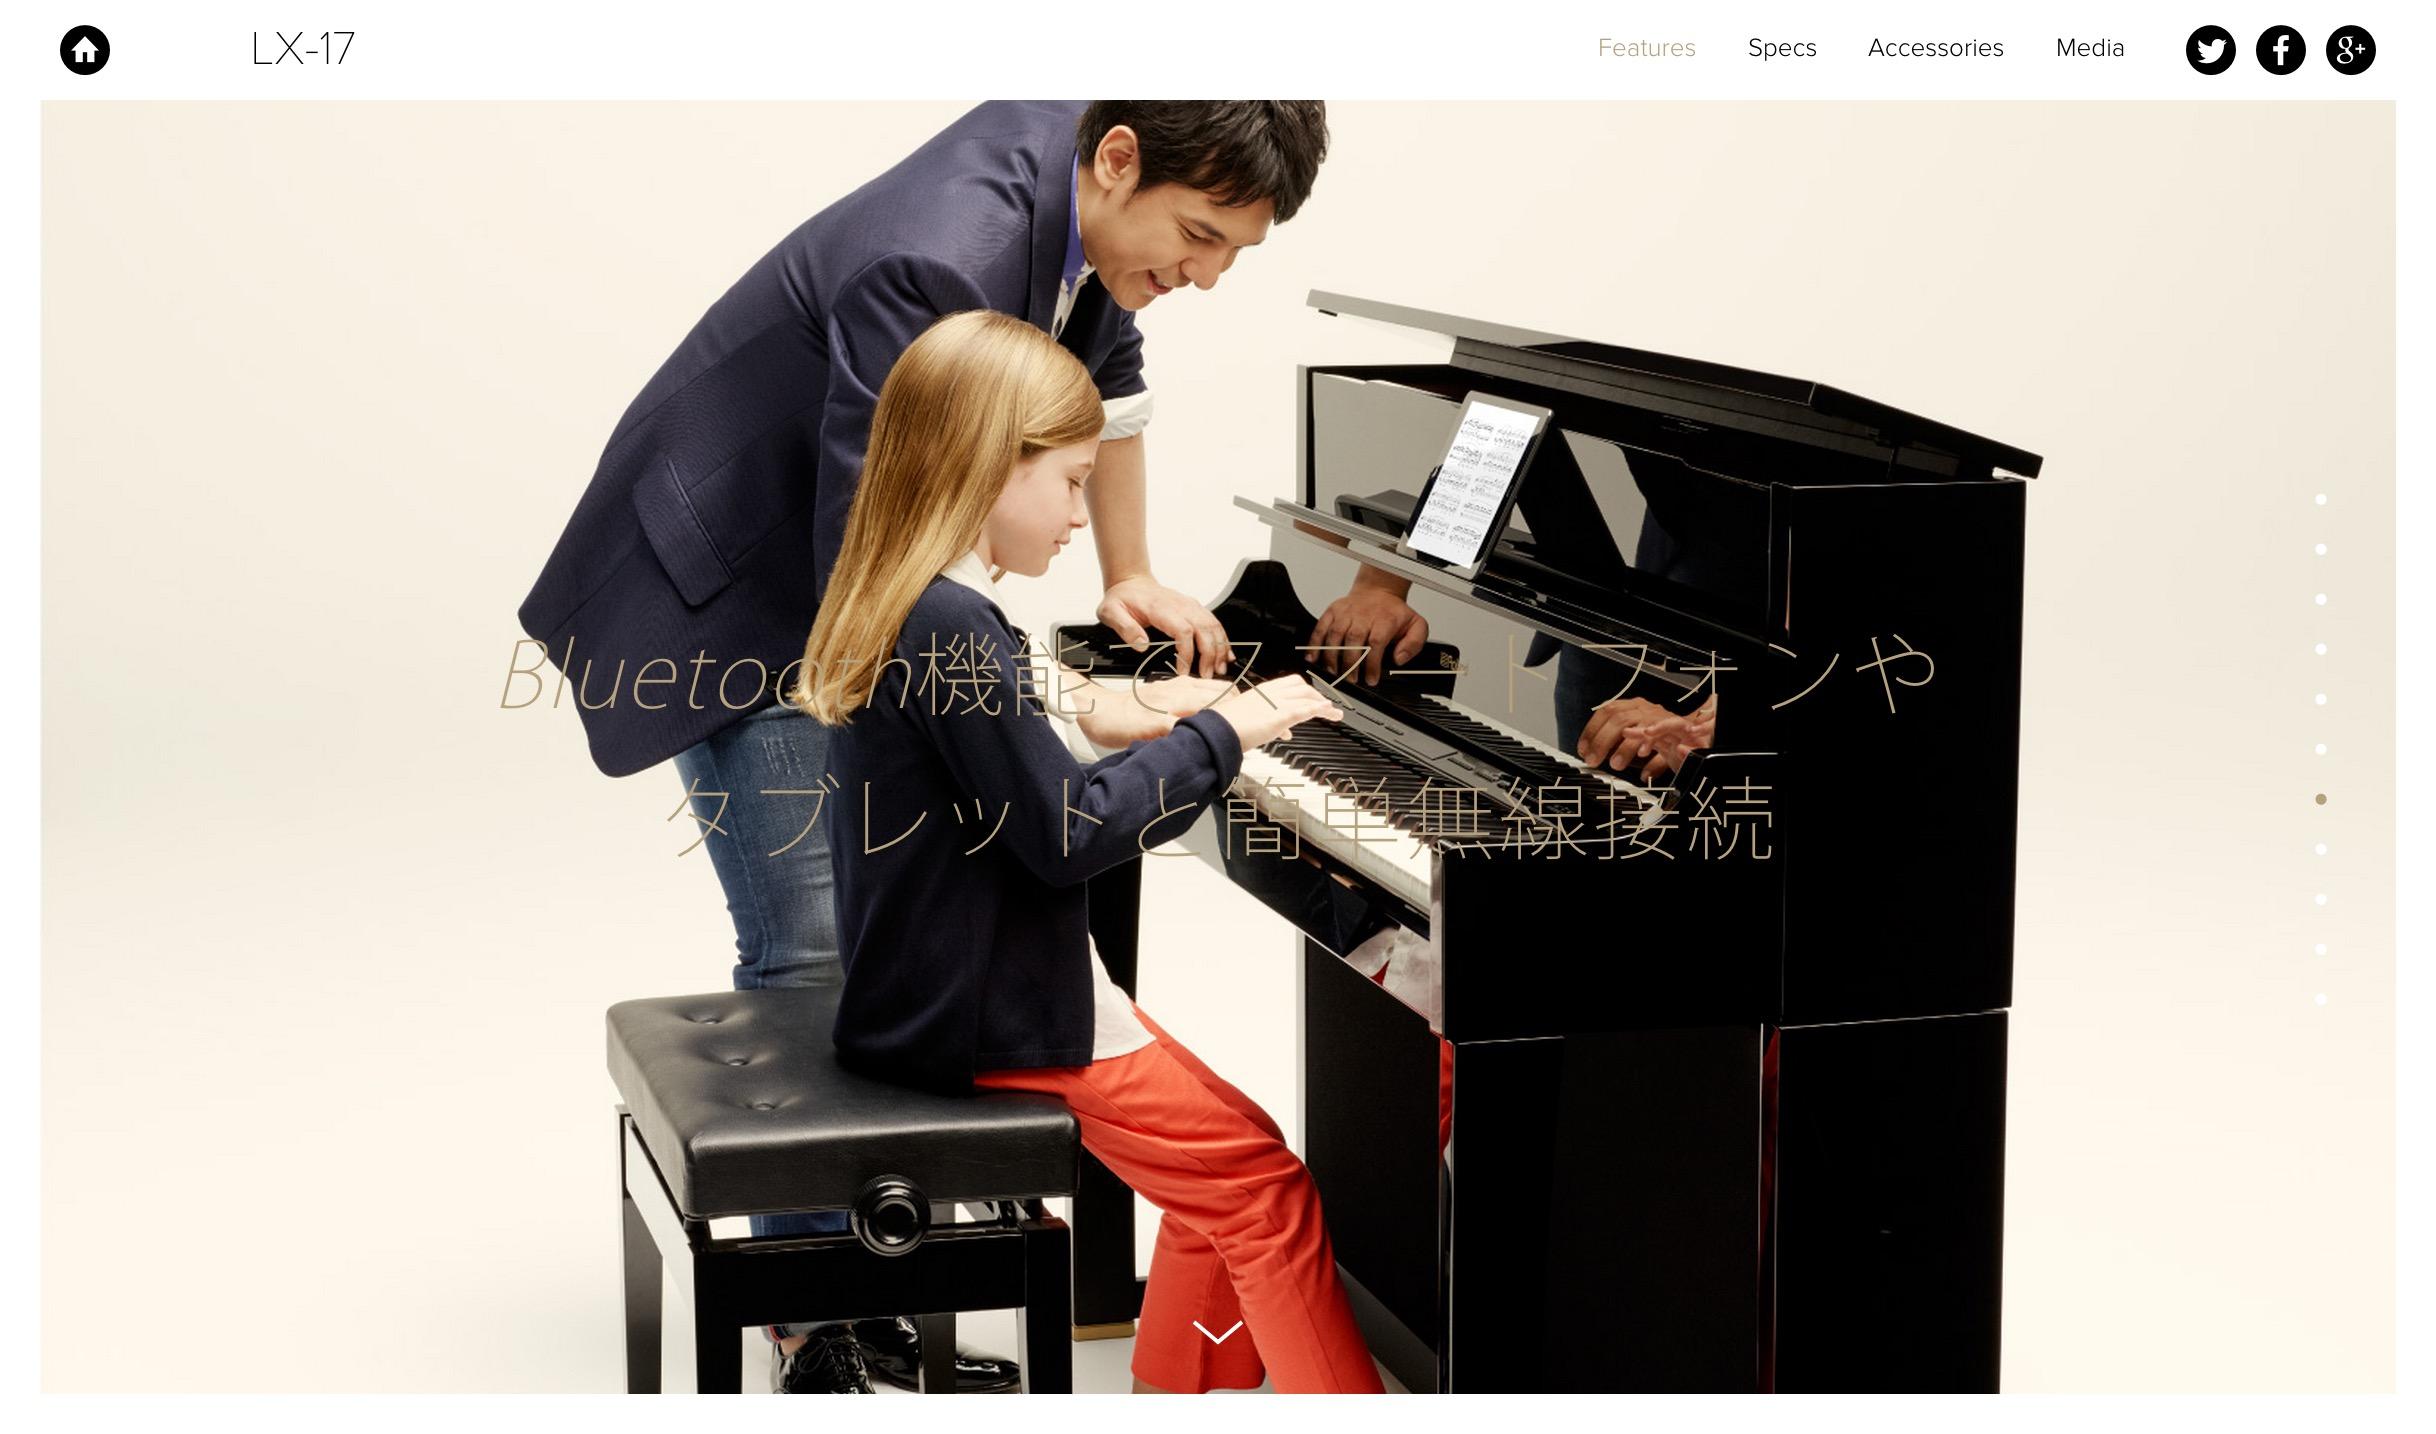 Roland LX 17   Digital Piano_3